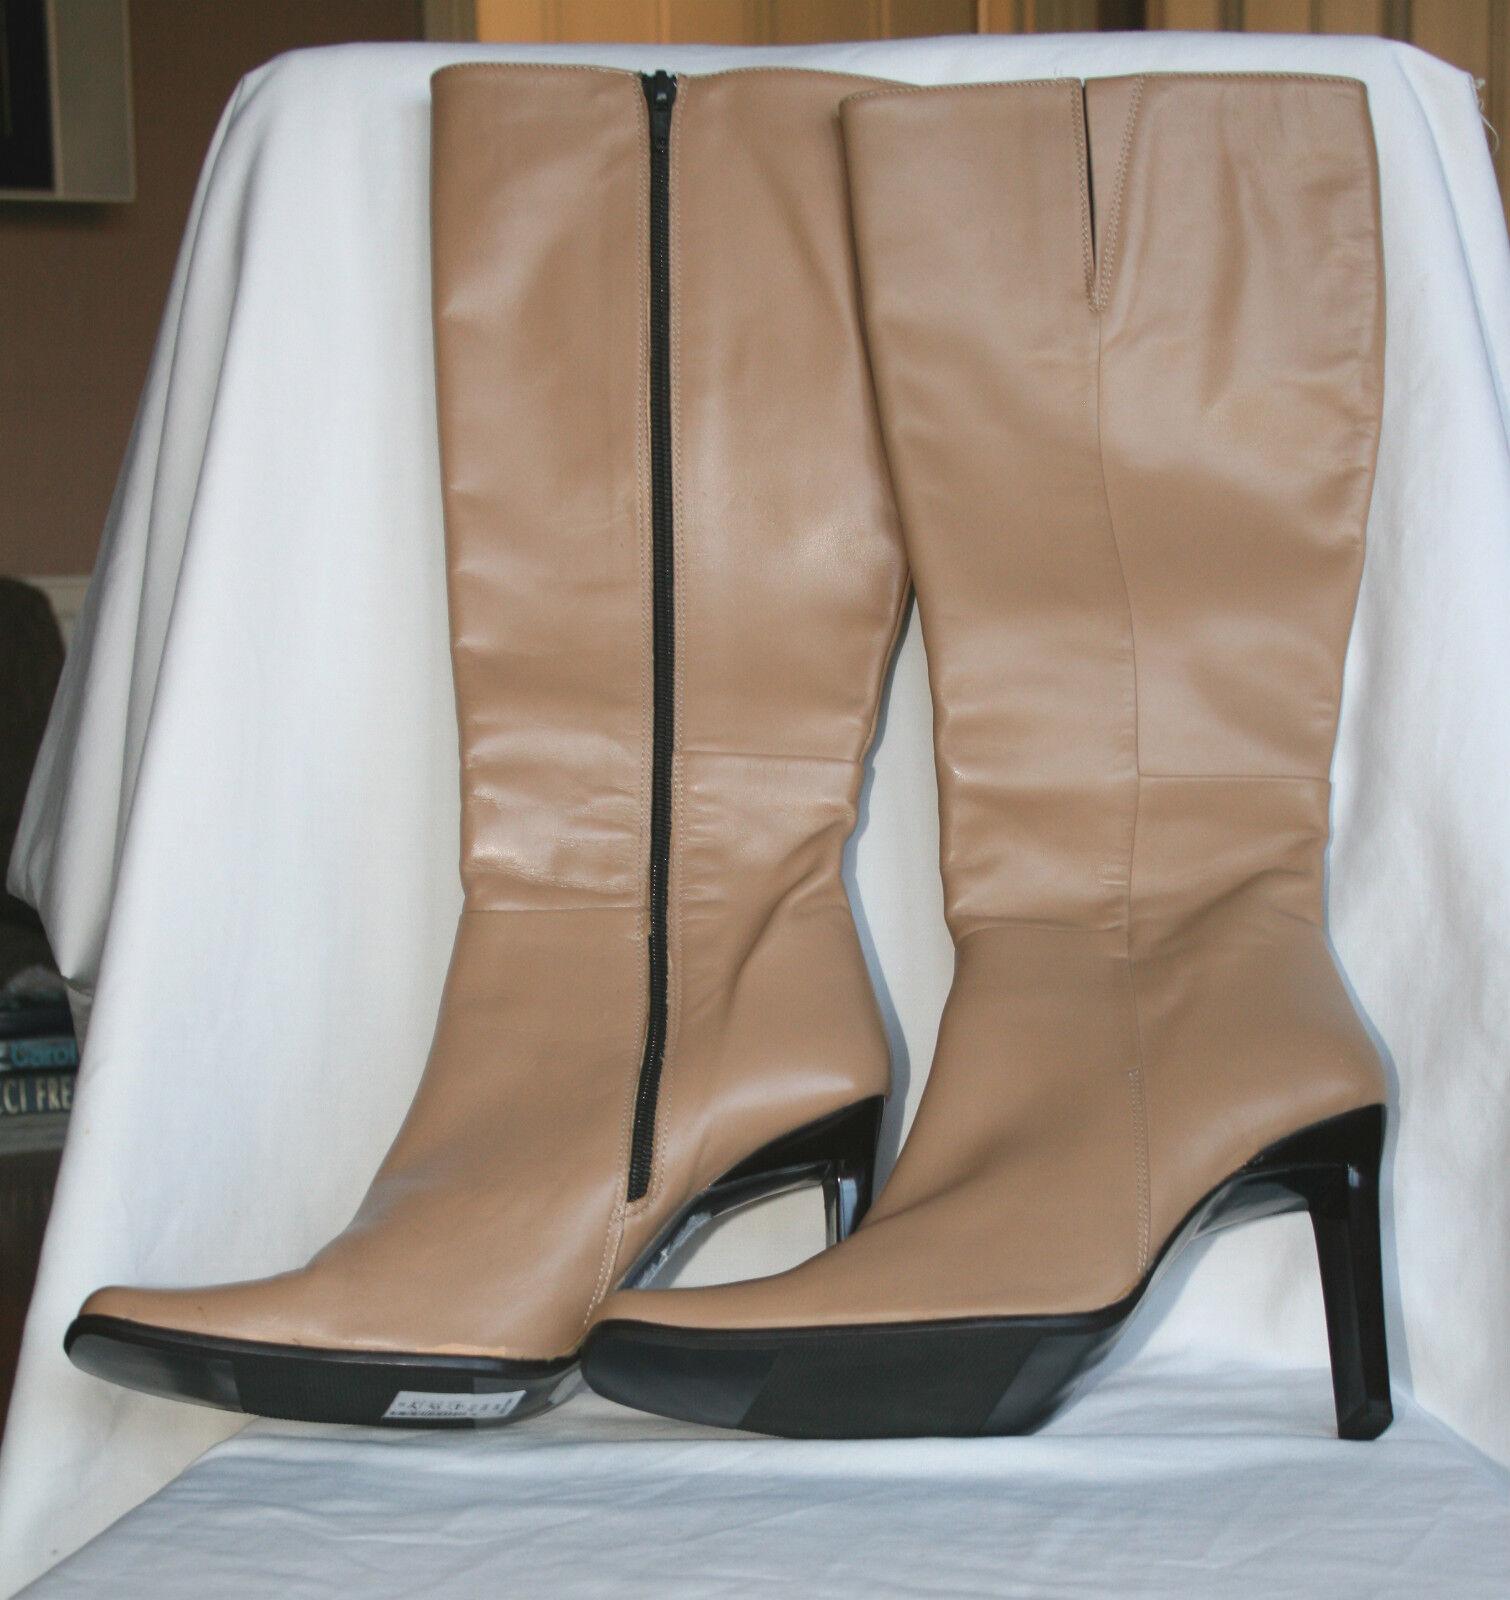 NEXT (UK6.5 / EU40) TAN LEATHER HIGH-HEELED ZIP FASTENING BOOTS - NEU